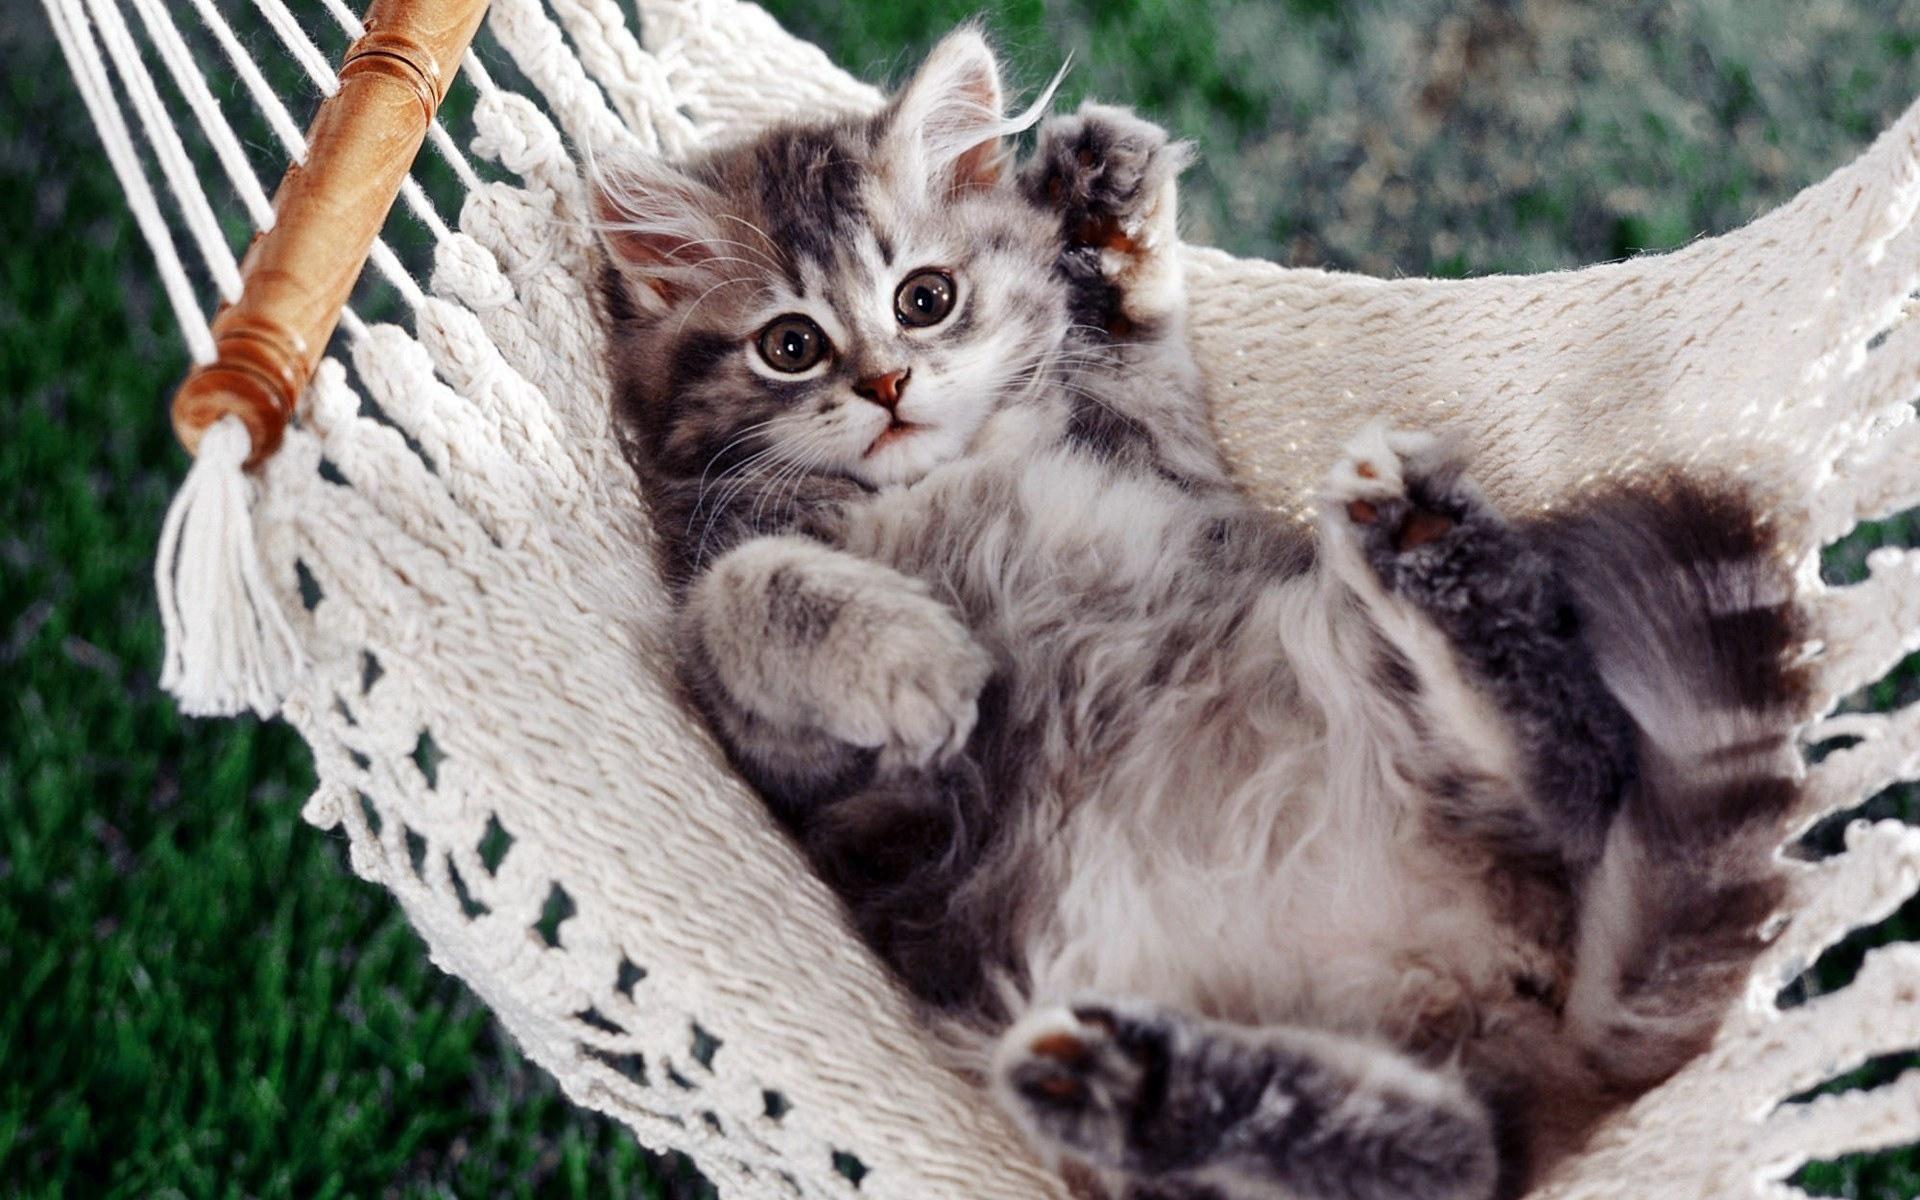 Cute Kitten Kittens Cutest Cute Animals Baby Animals